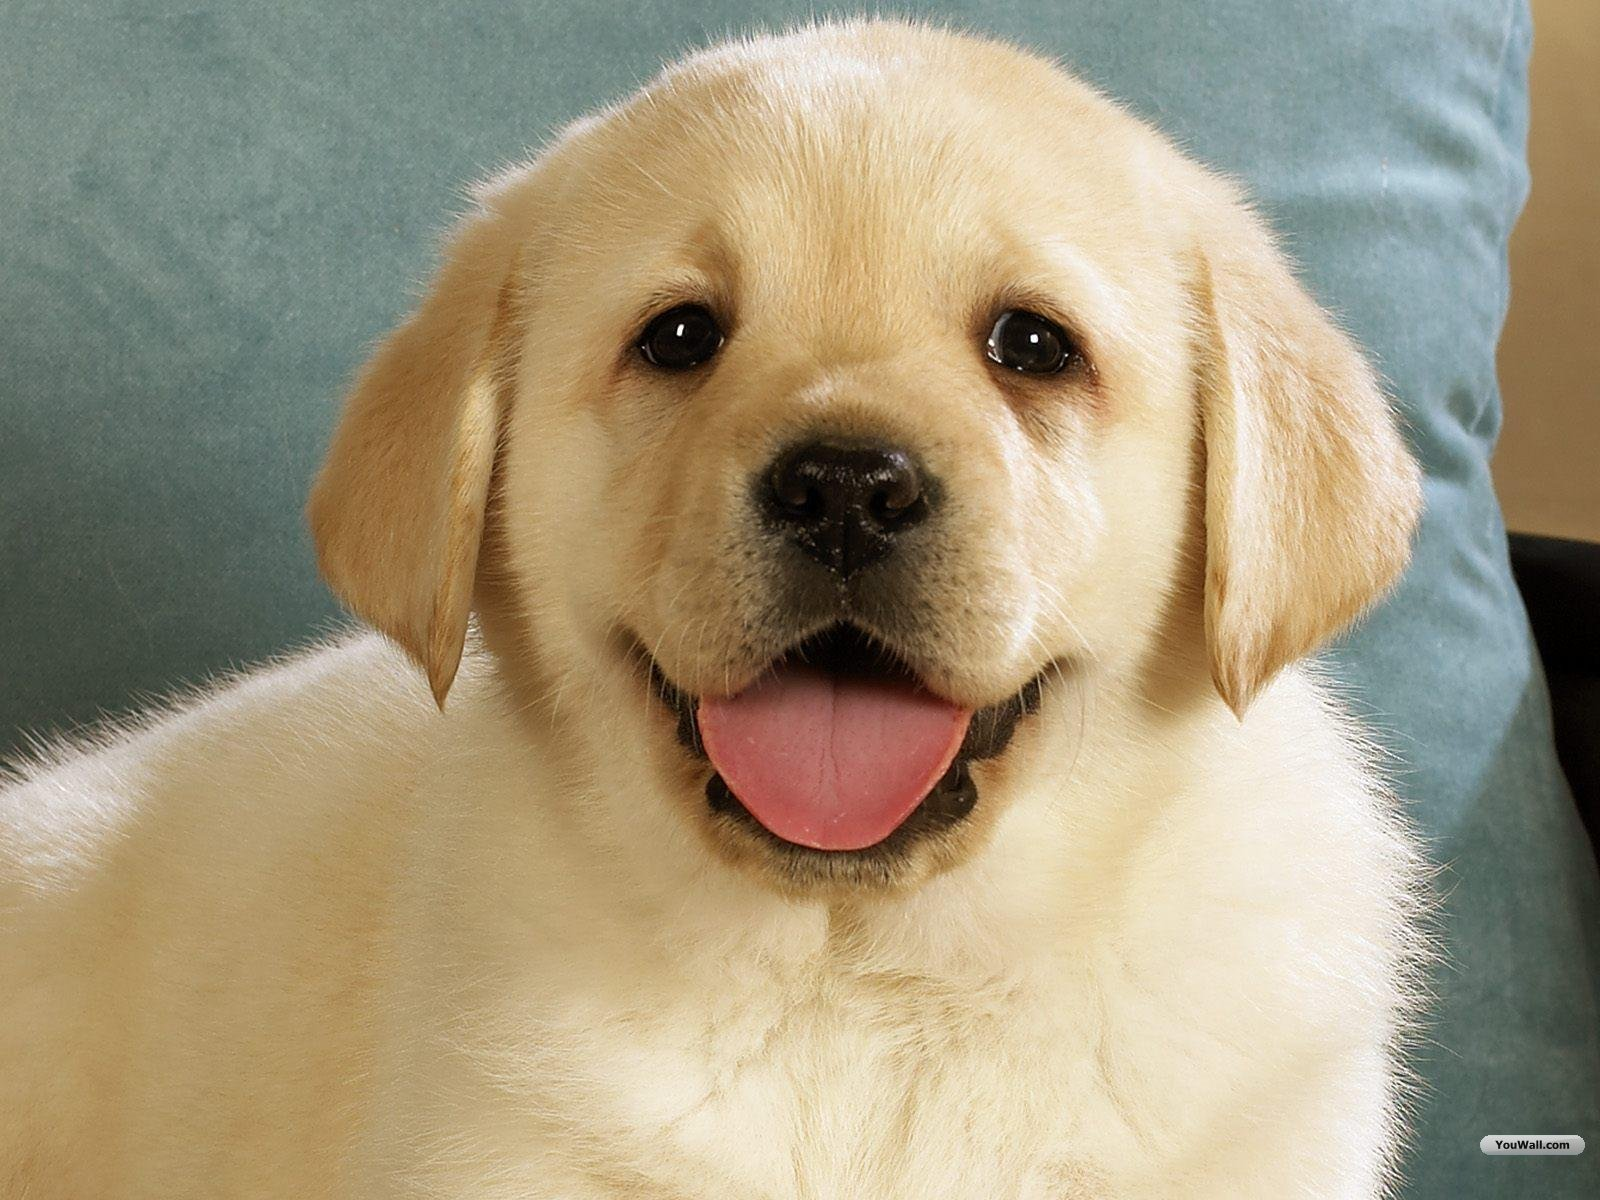 48+ Wallpapers of Cute Dogs on WallpaperSafari